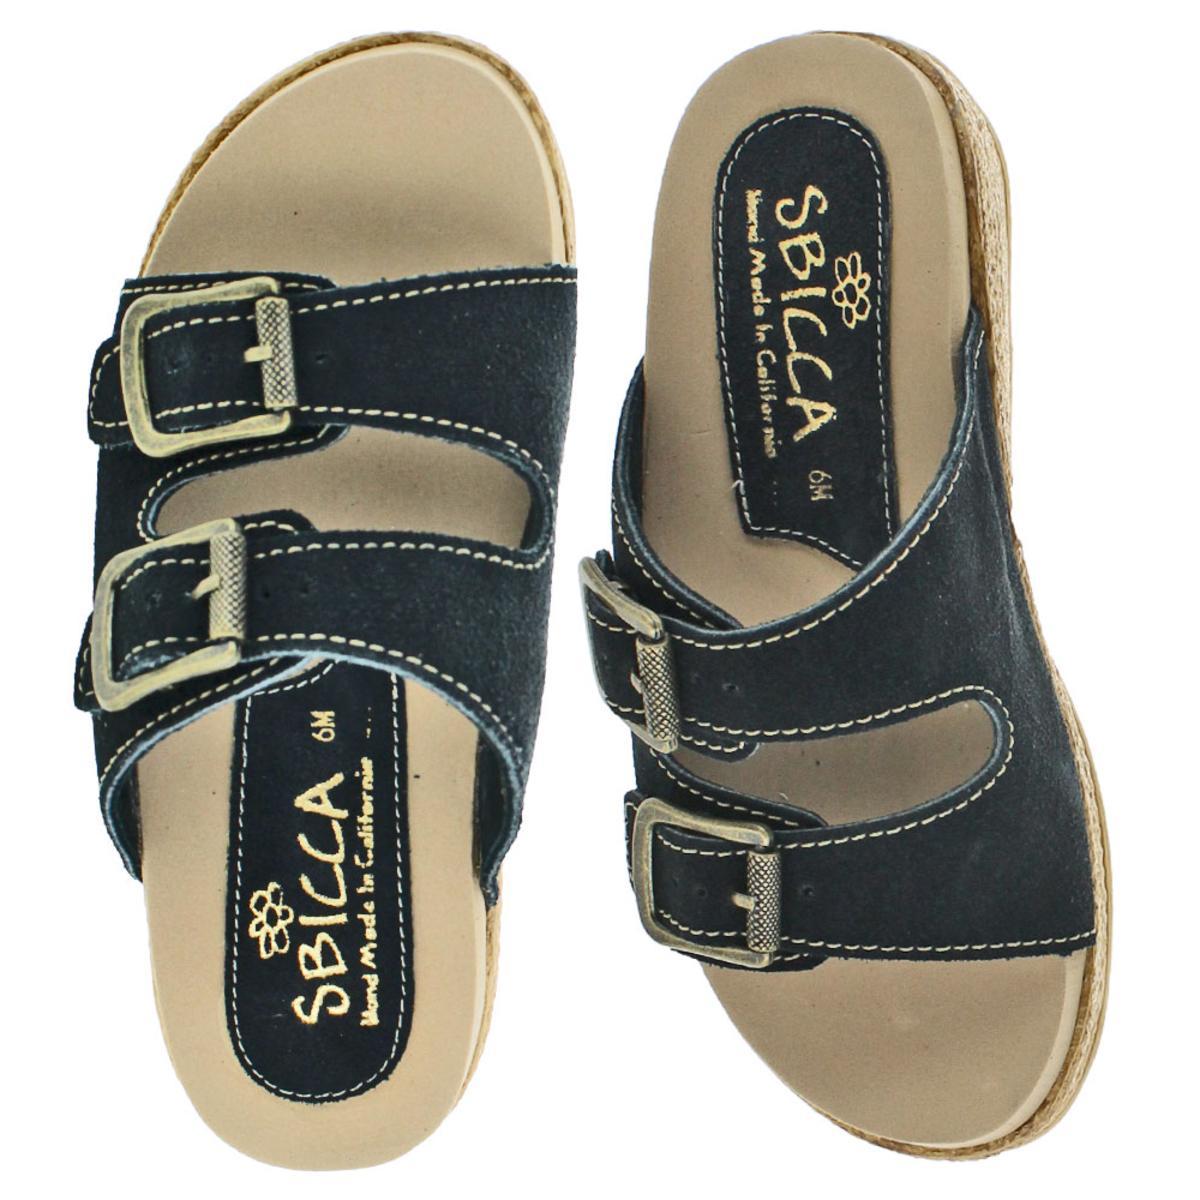 Sbicca-Espadrille-Buckle-Women-039-s-Buckle-Slide-Sandals thumbnail 6